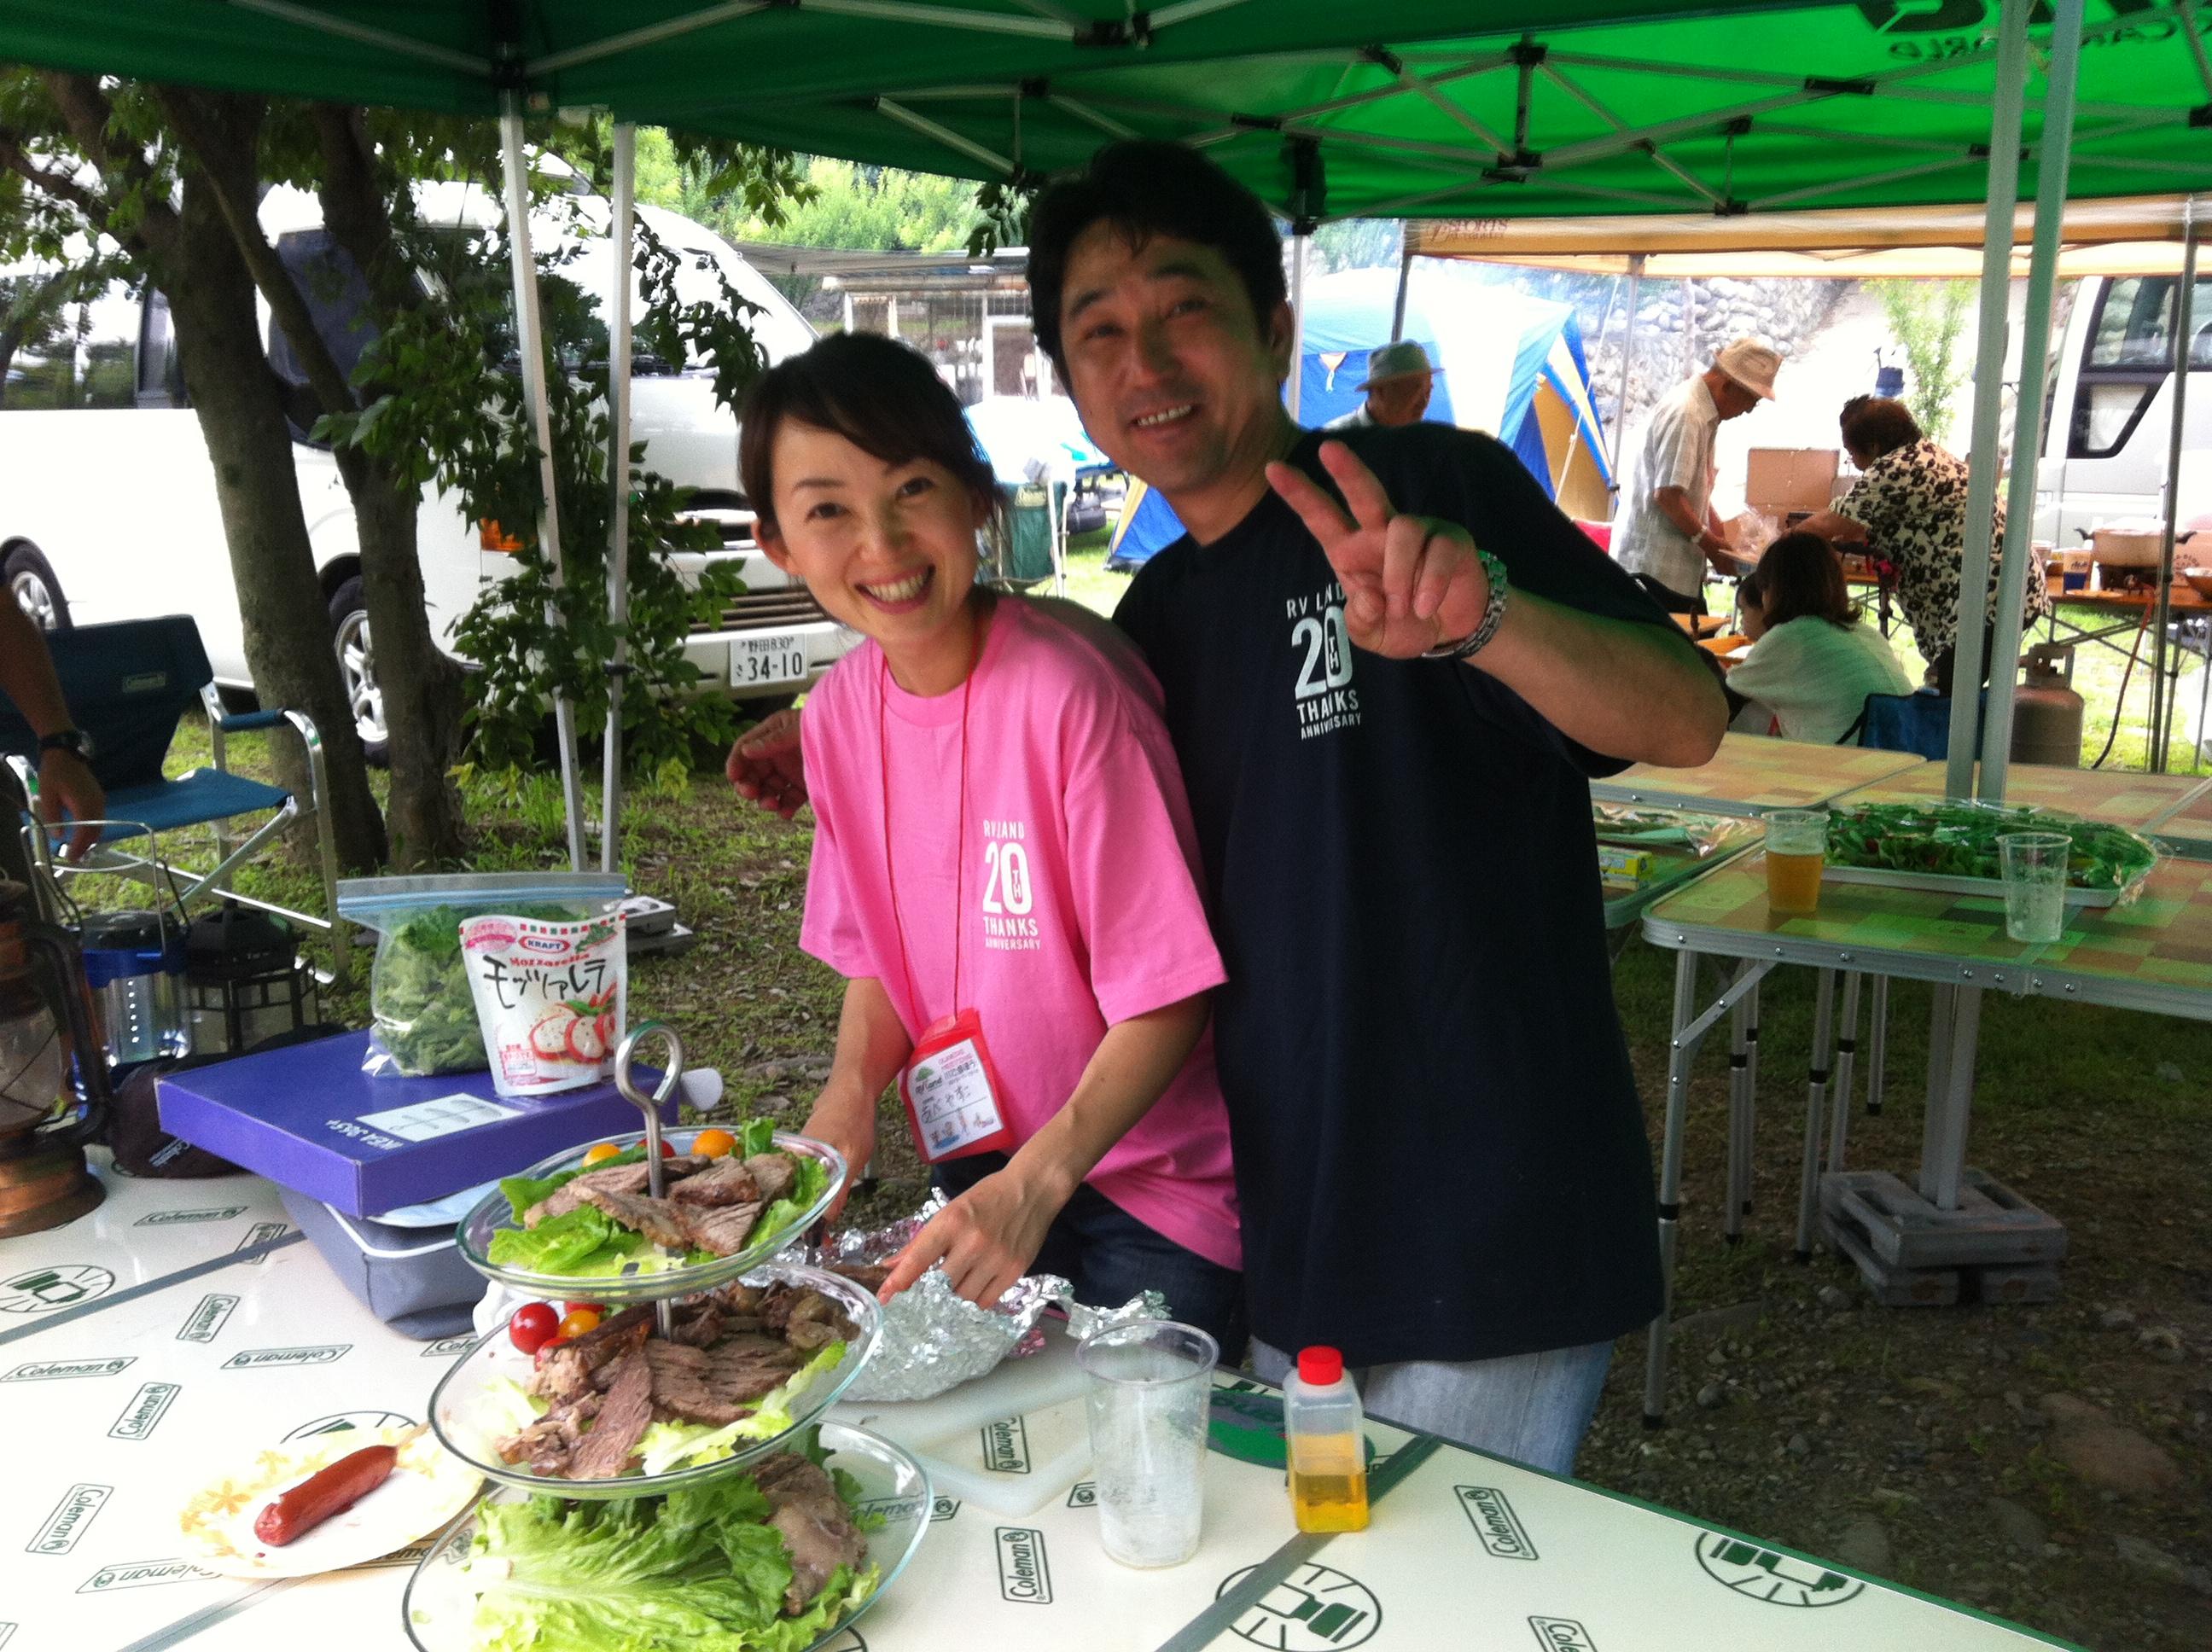 http://www.vantech.jp/shops/info/IMG_6292.JPG